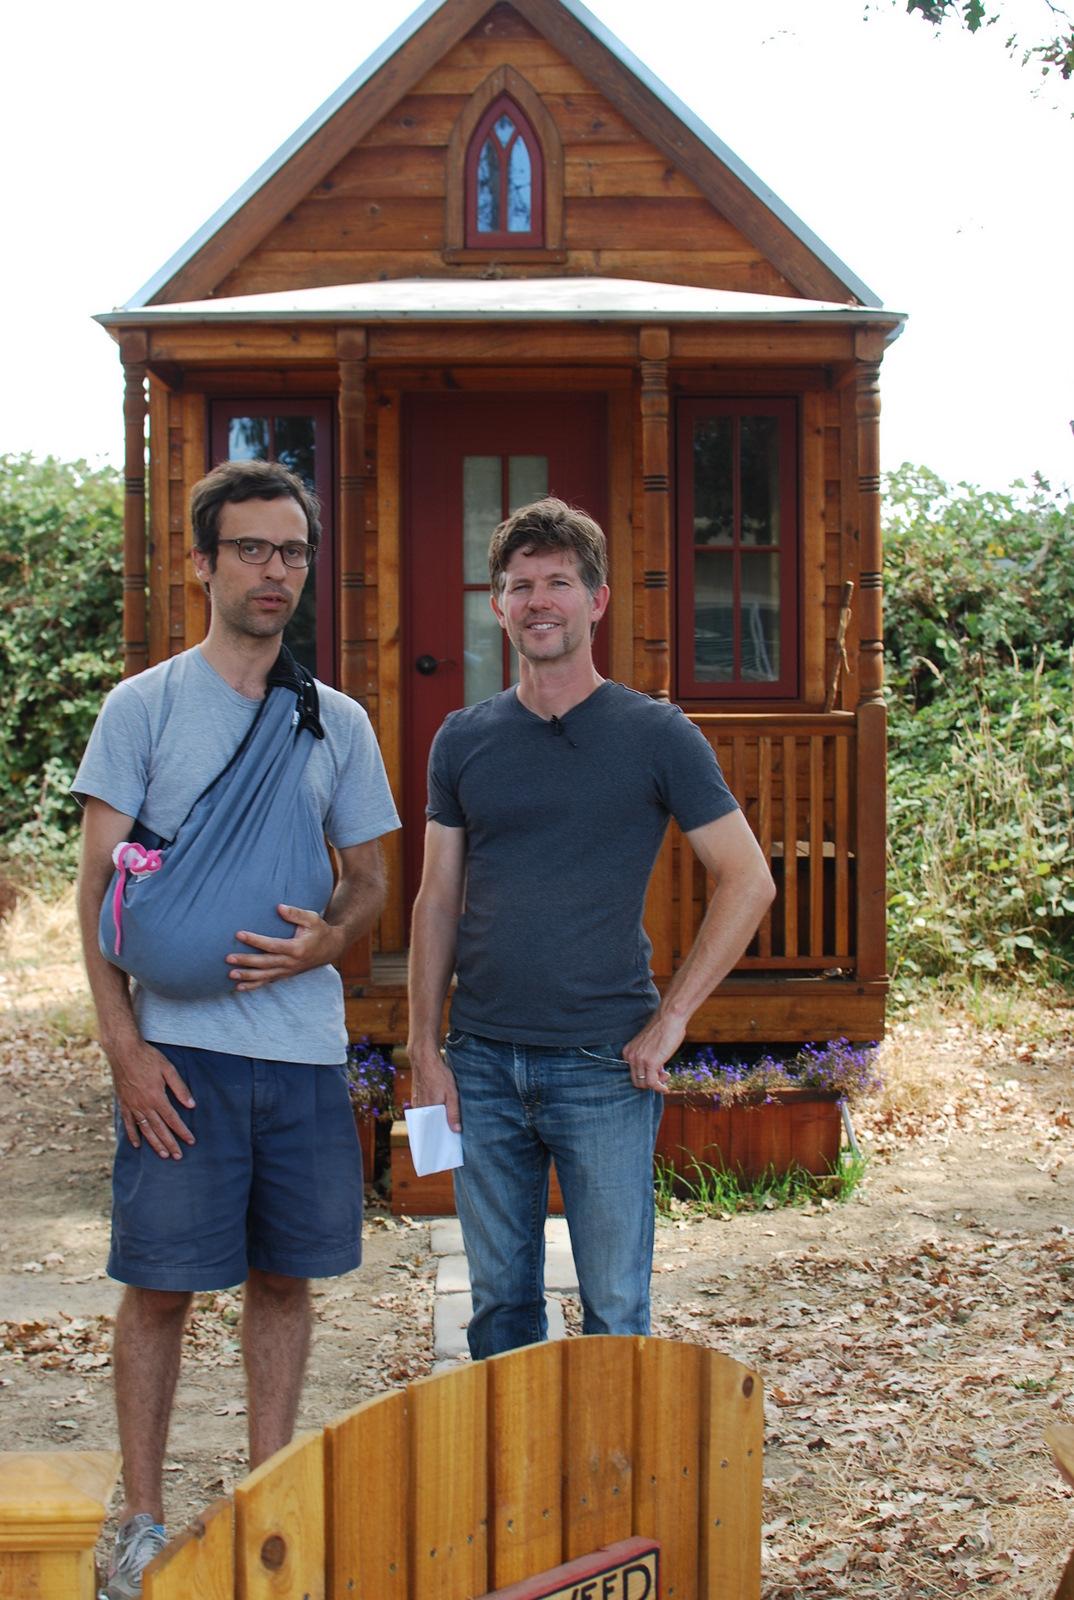 nicolás boullosa (left) & jay shafer (right)